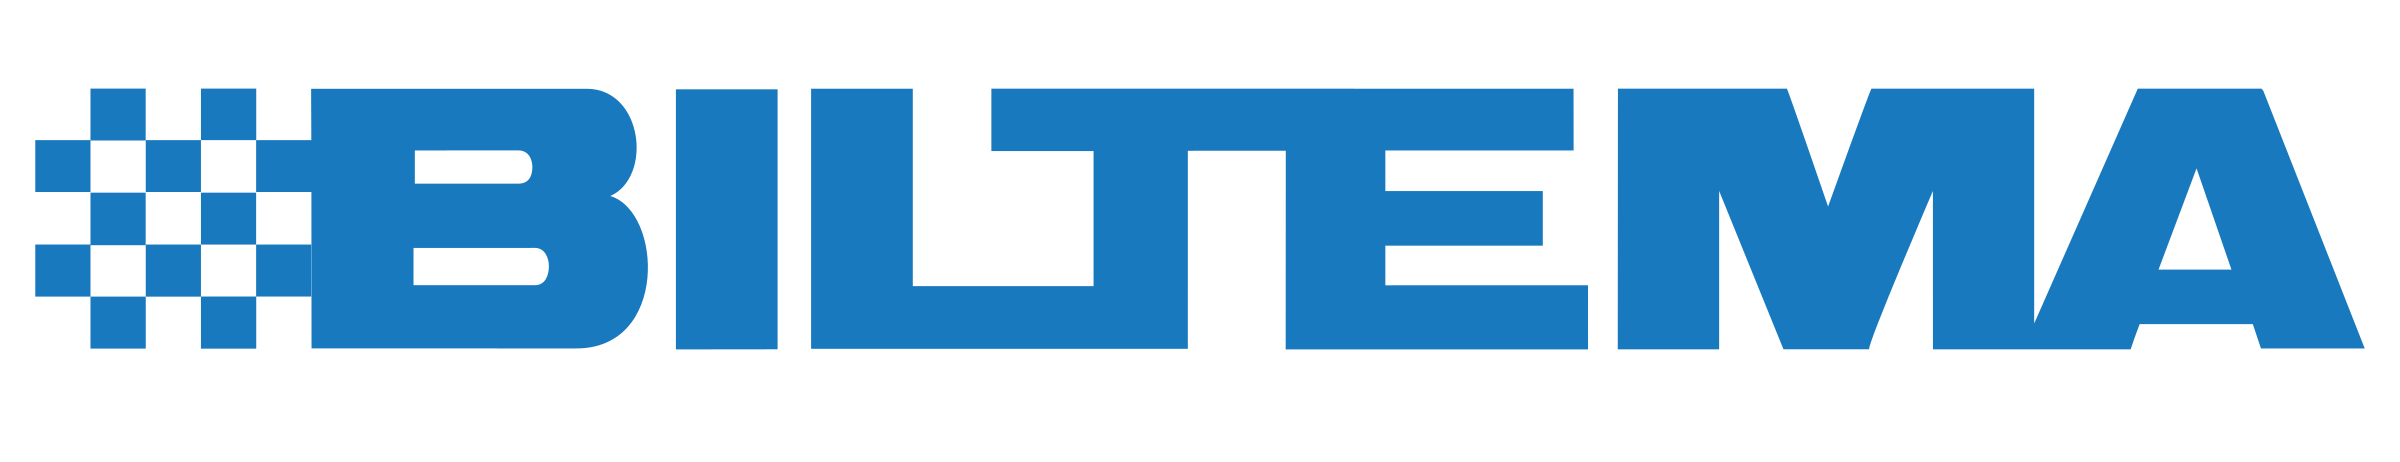 Biltema Norge AS avd Harstad logo